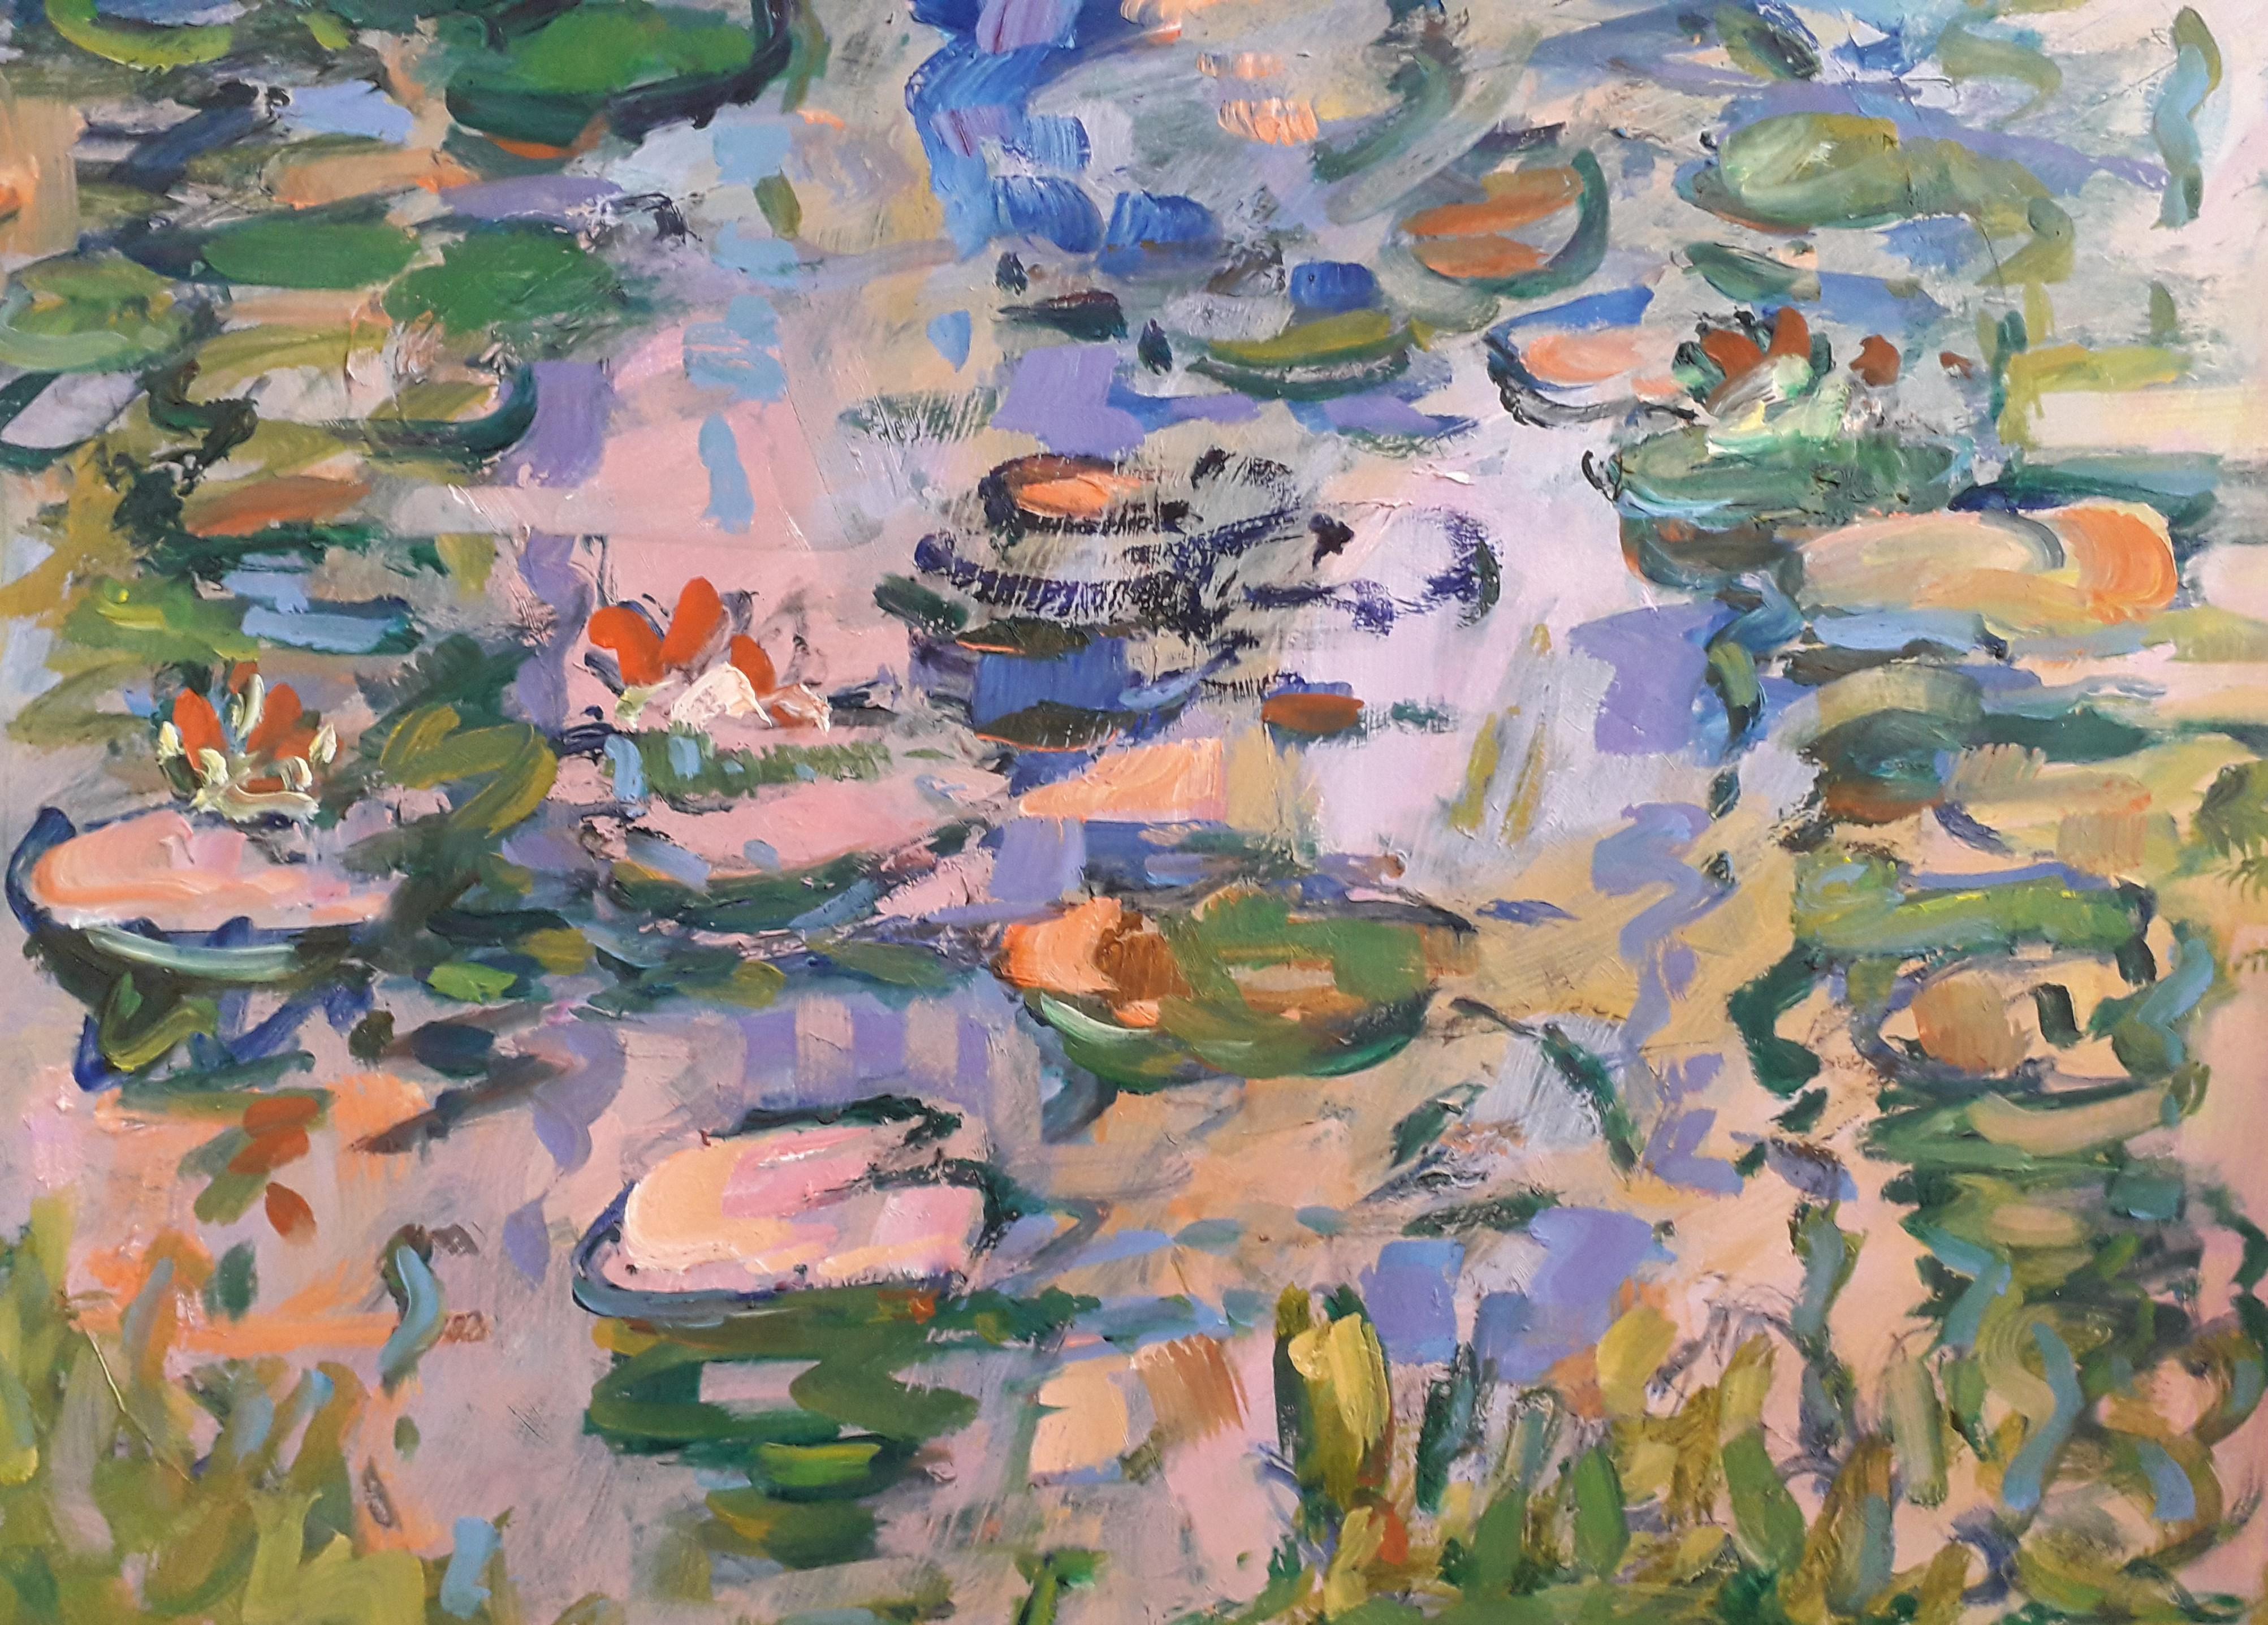 Frans Bianchi Waterlelies4